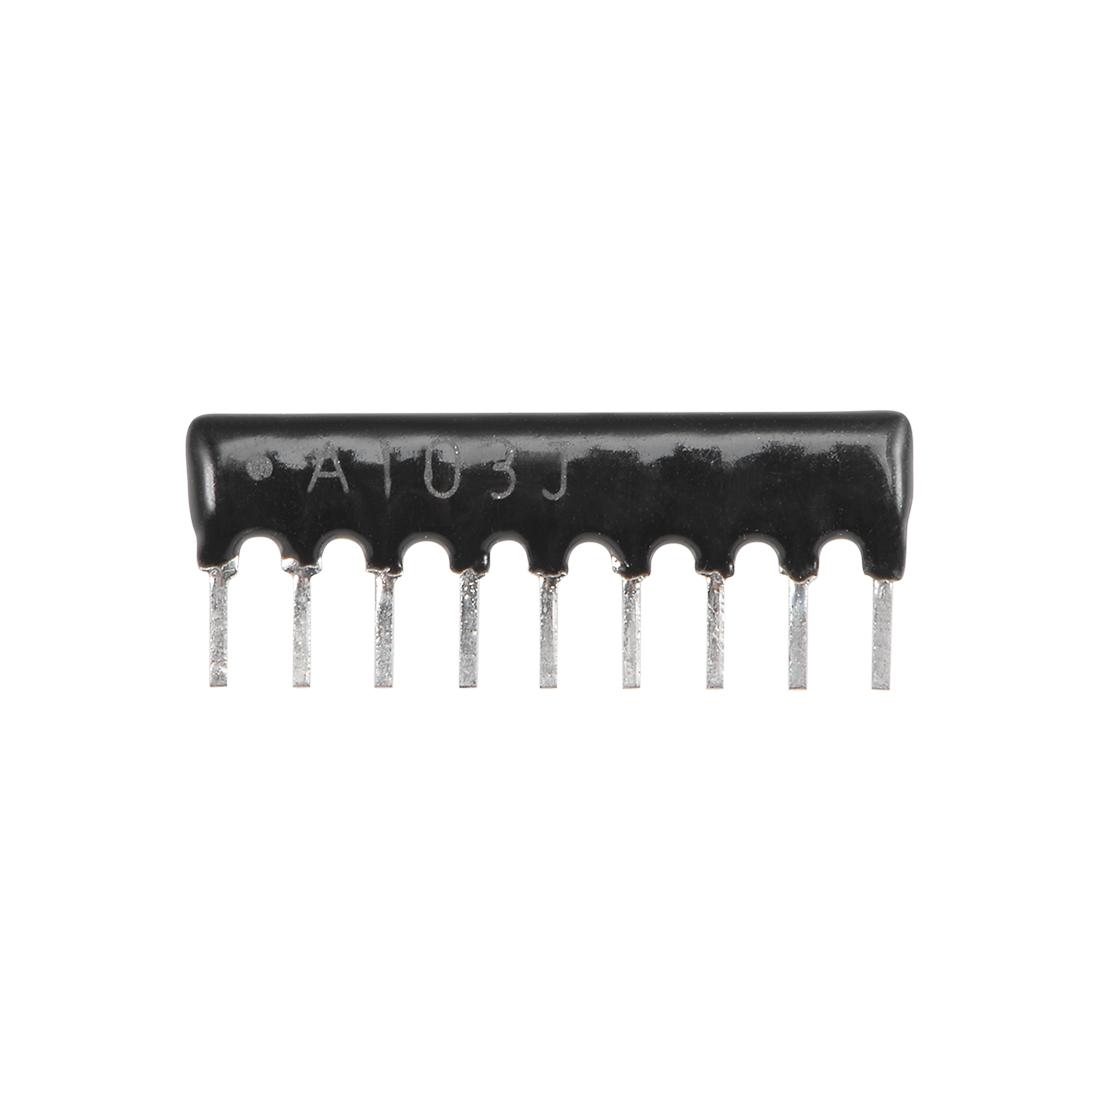 10K Ohm Resistor Network 1/8W SIP-9 Array 2.54mm Bussed Type 5% Tolerance 20pcs